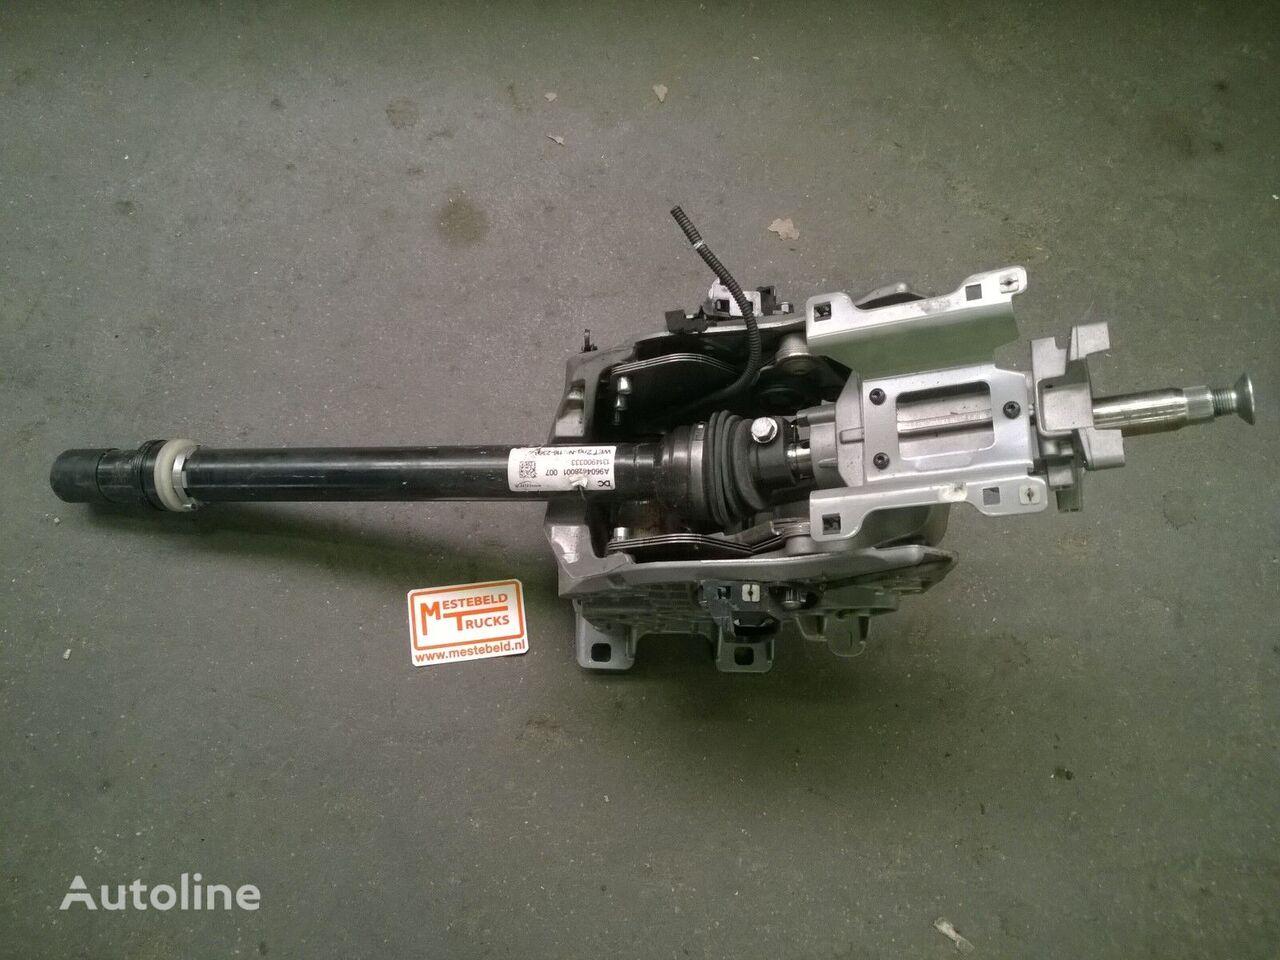 рулевой редуктор  Stuurkolom для грузовика MERCEDES-BENZ Stuurkolom MP4